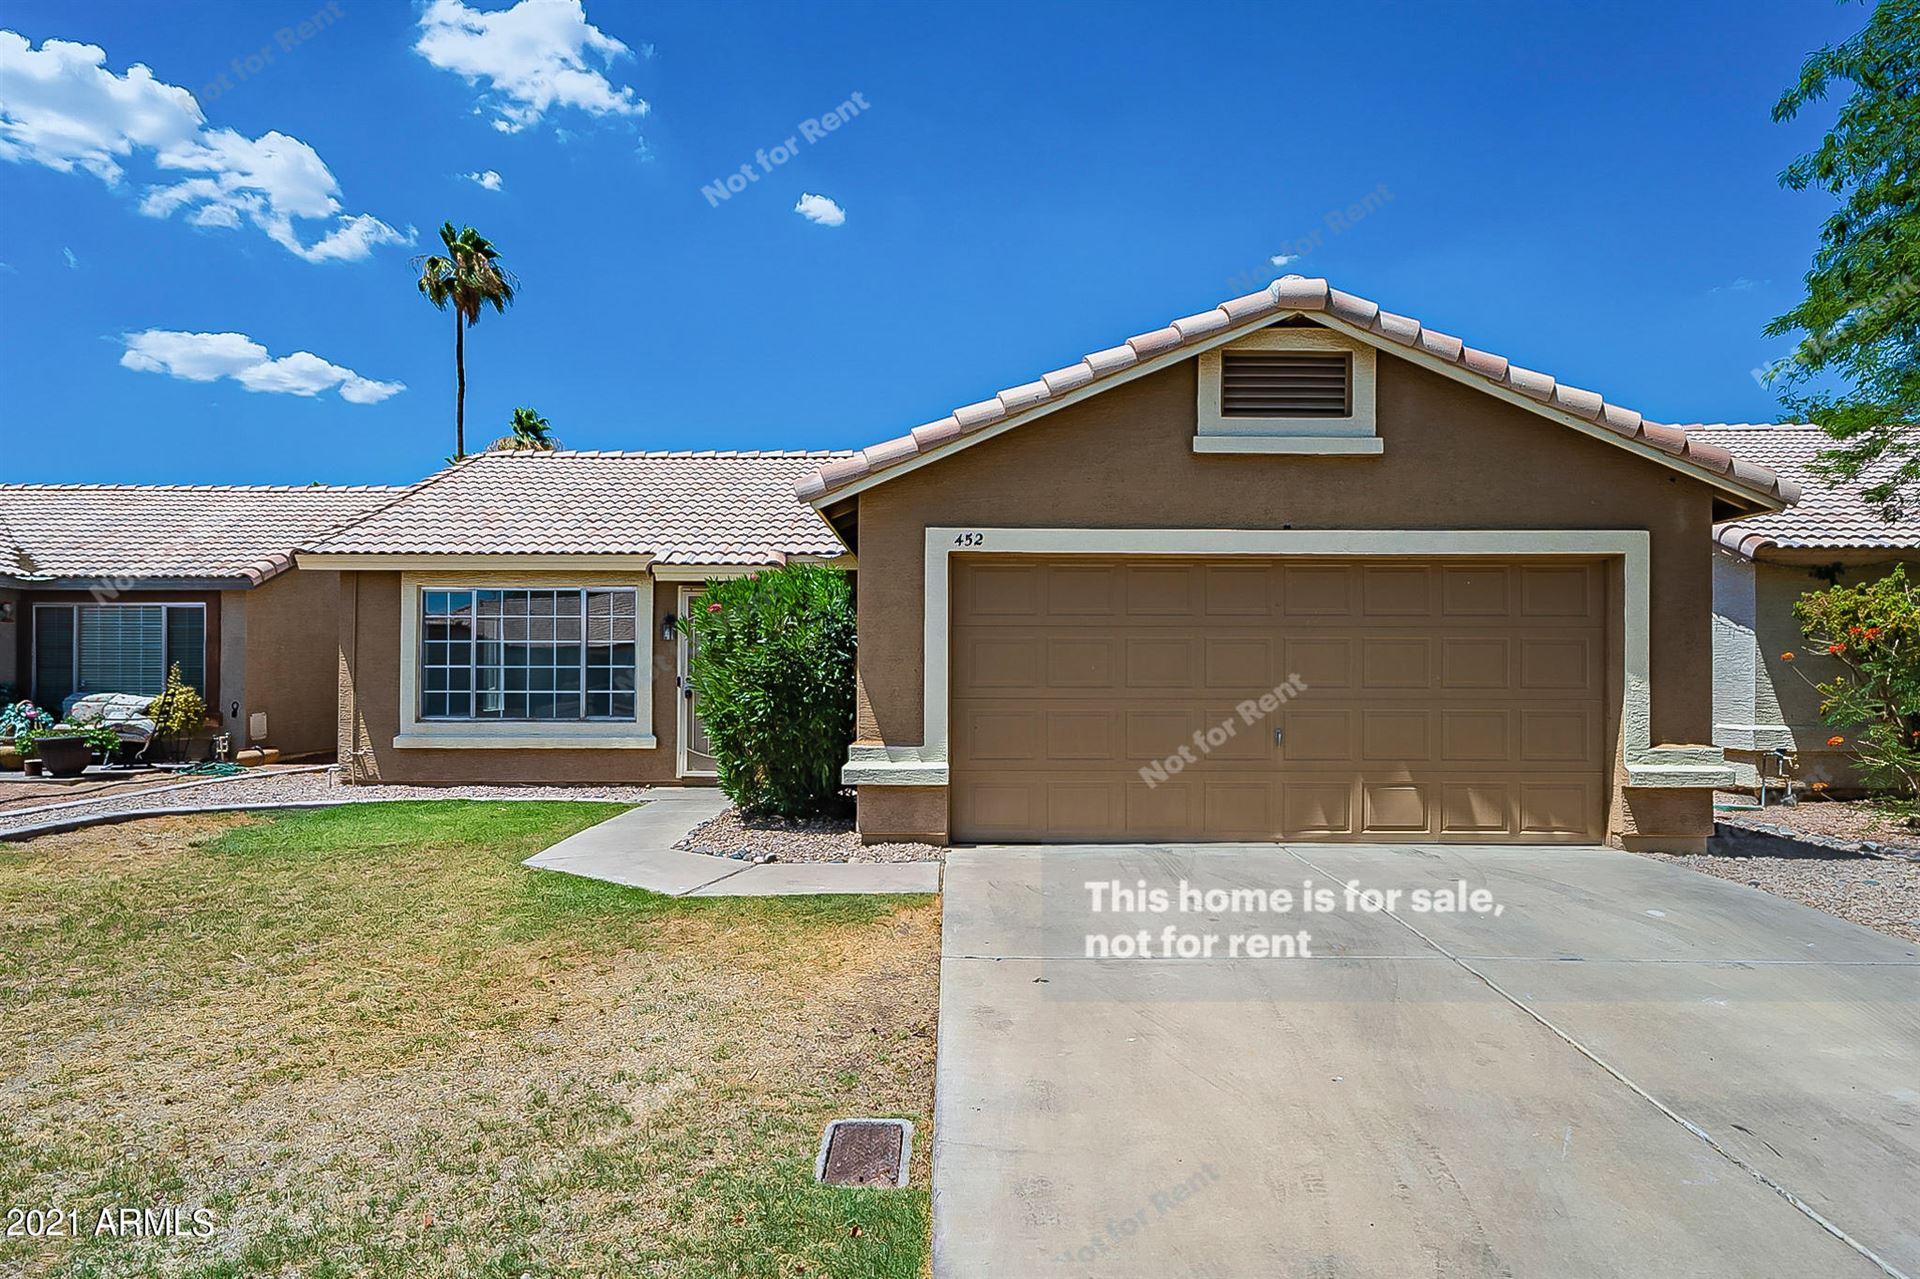 452 E HARRISON Street, Chandler, AZ 85225 - MLS#: 6256584